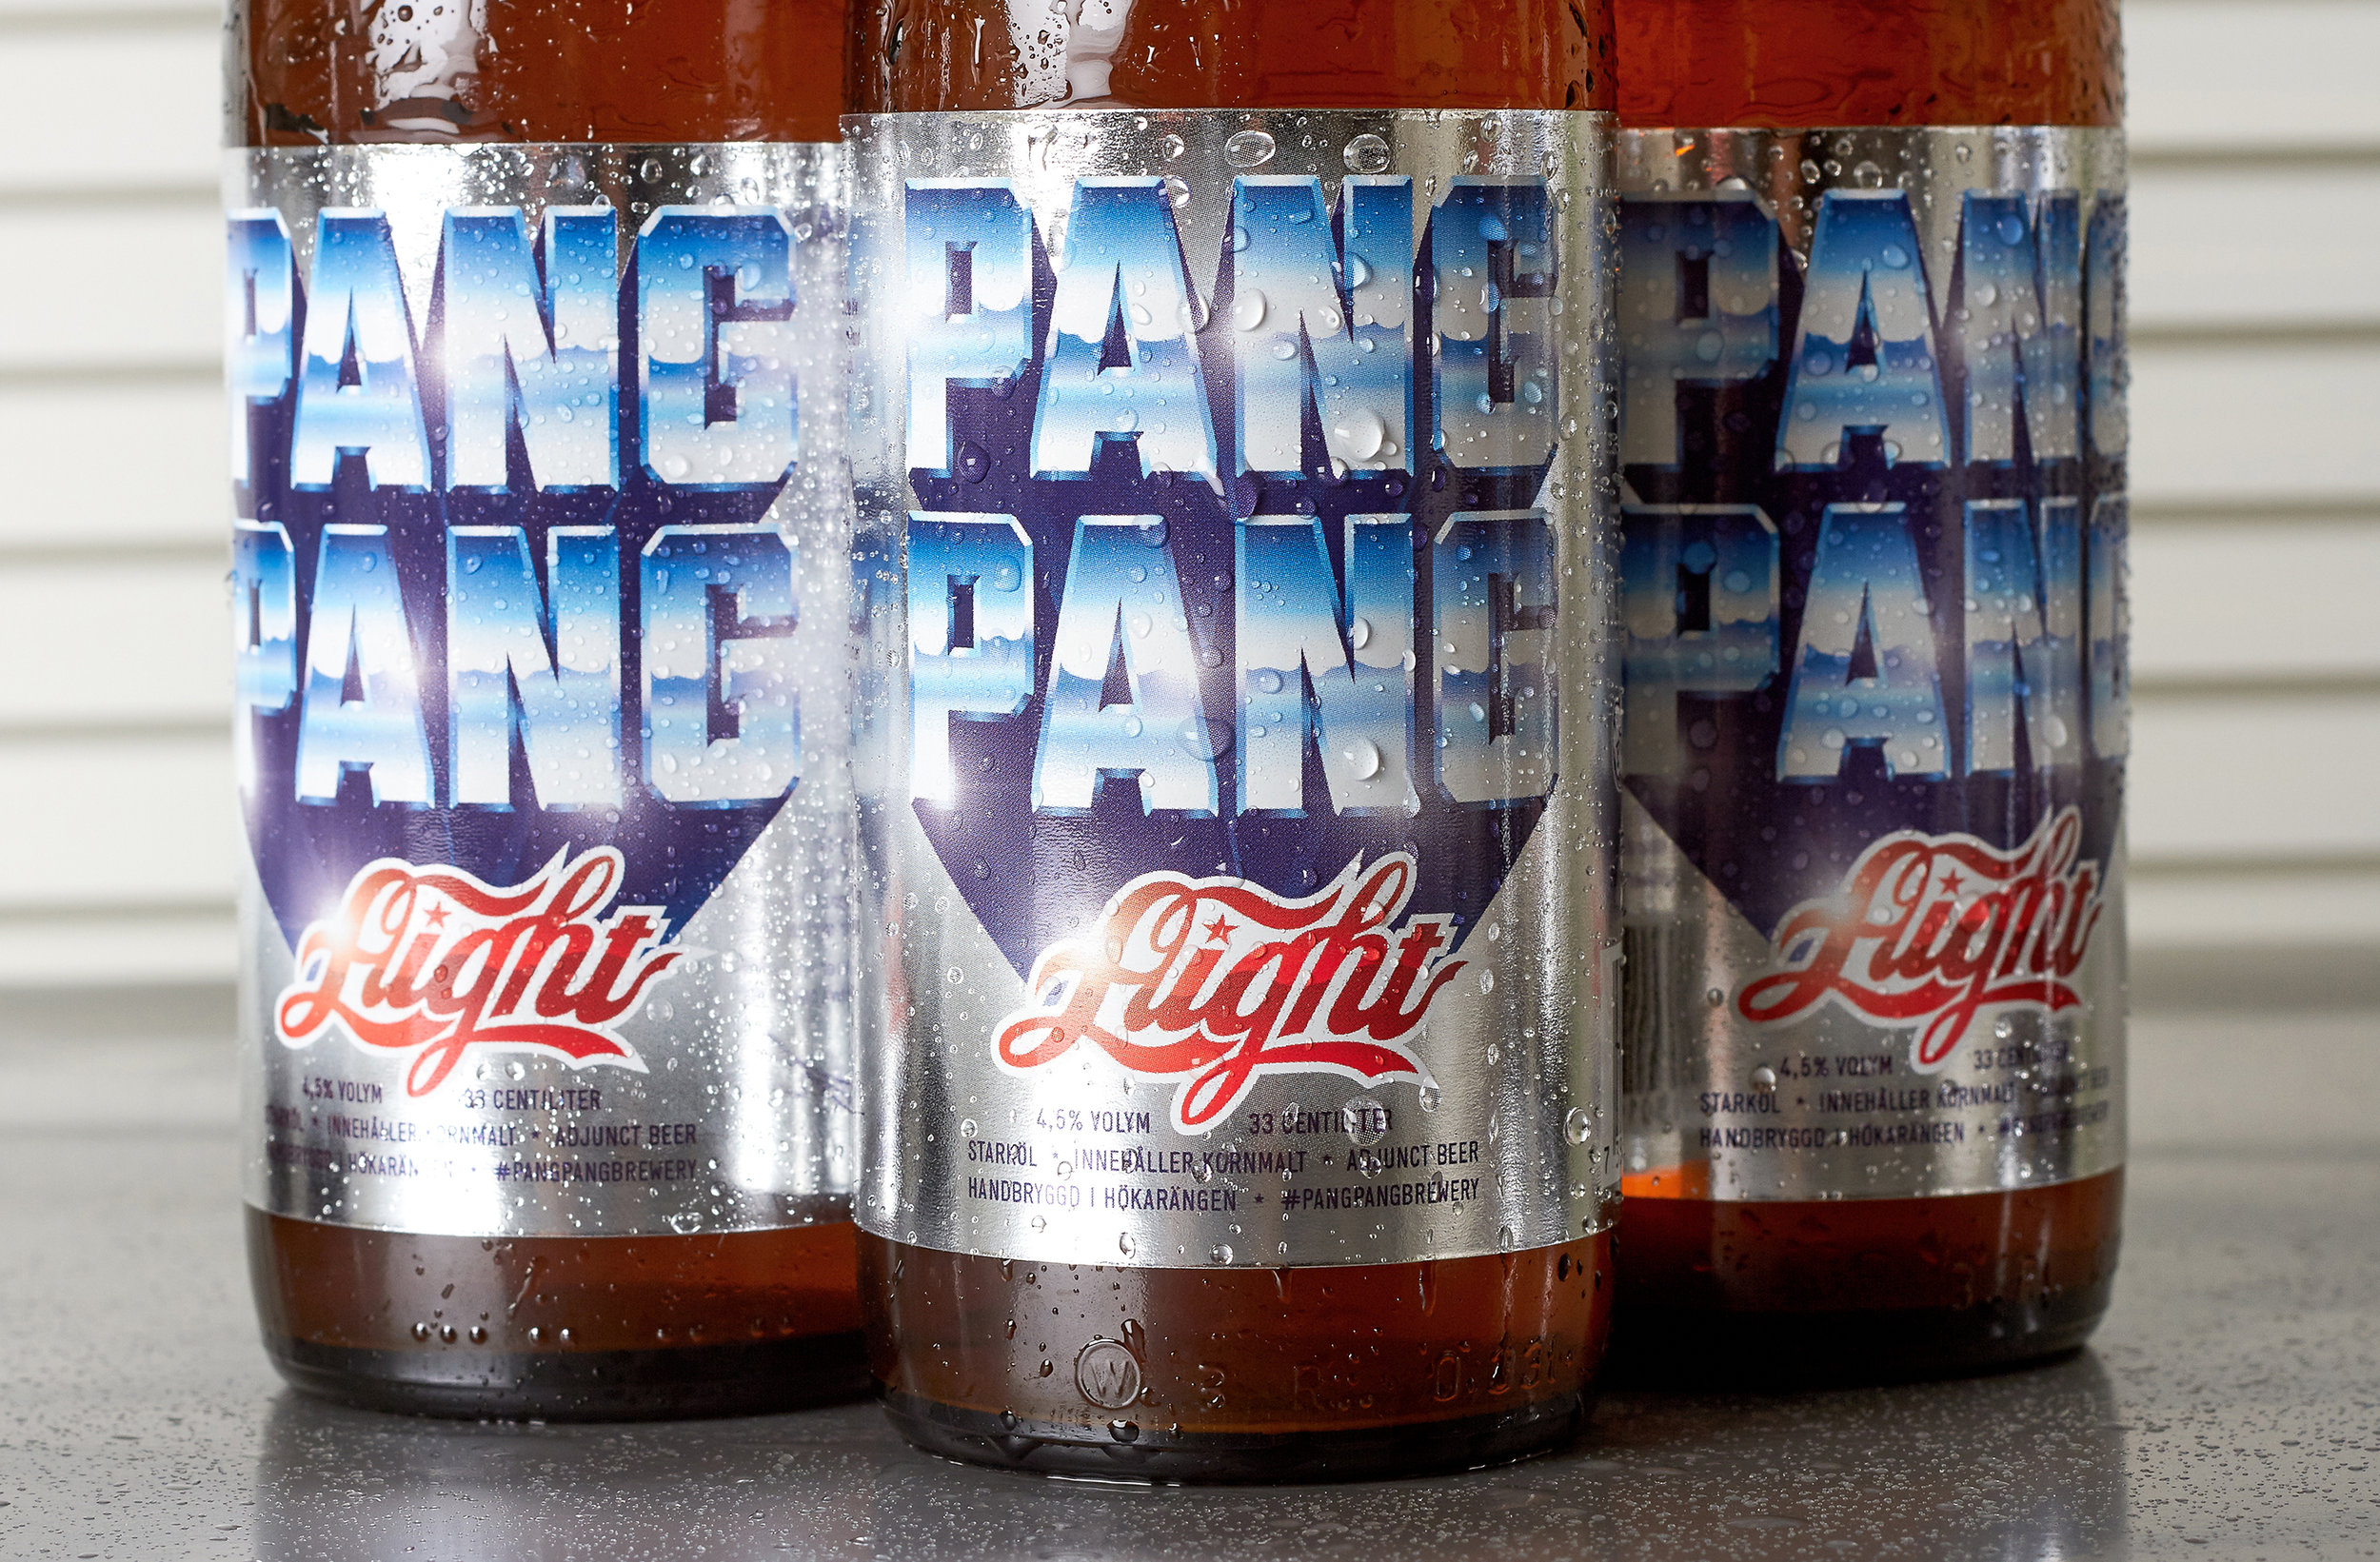 pangpang_aight_3-bottles-close-up.jpg